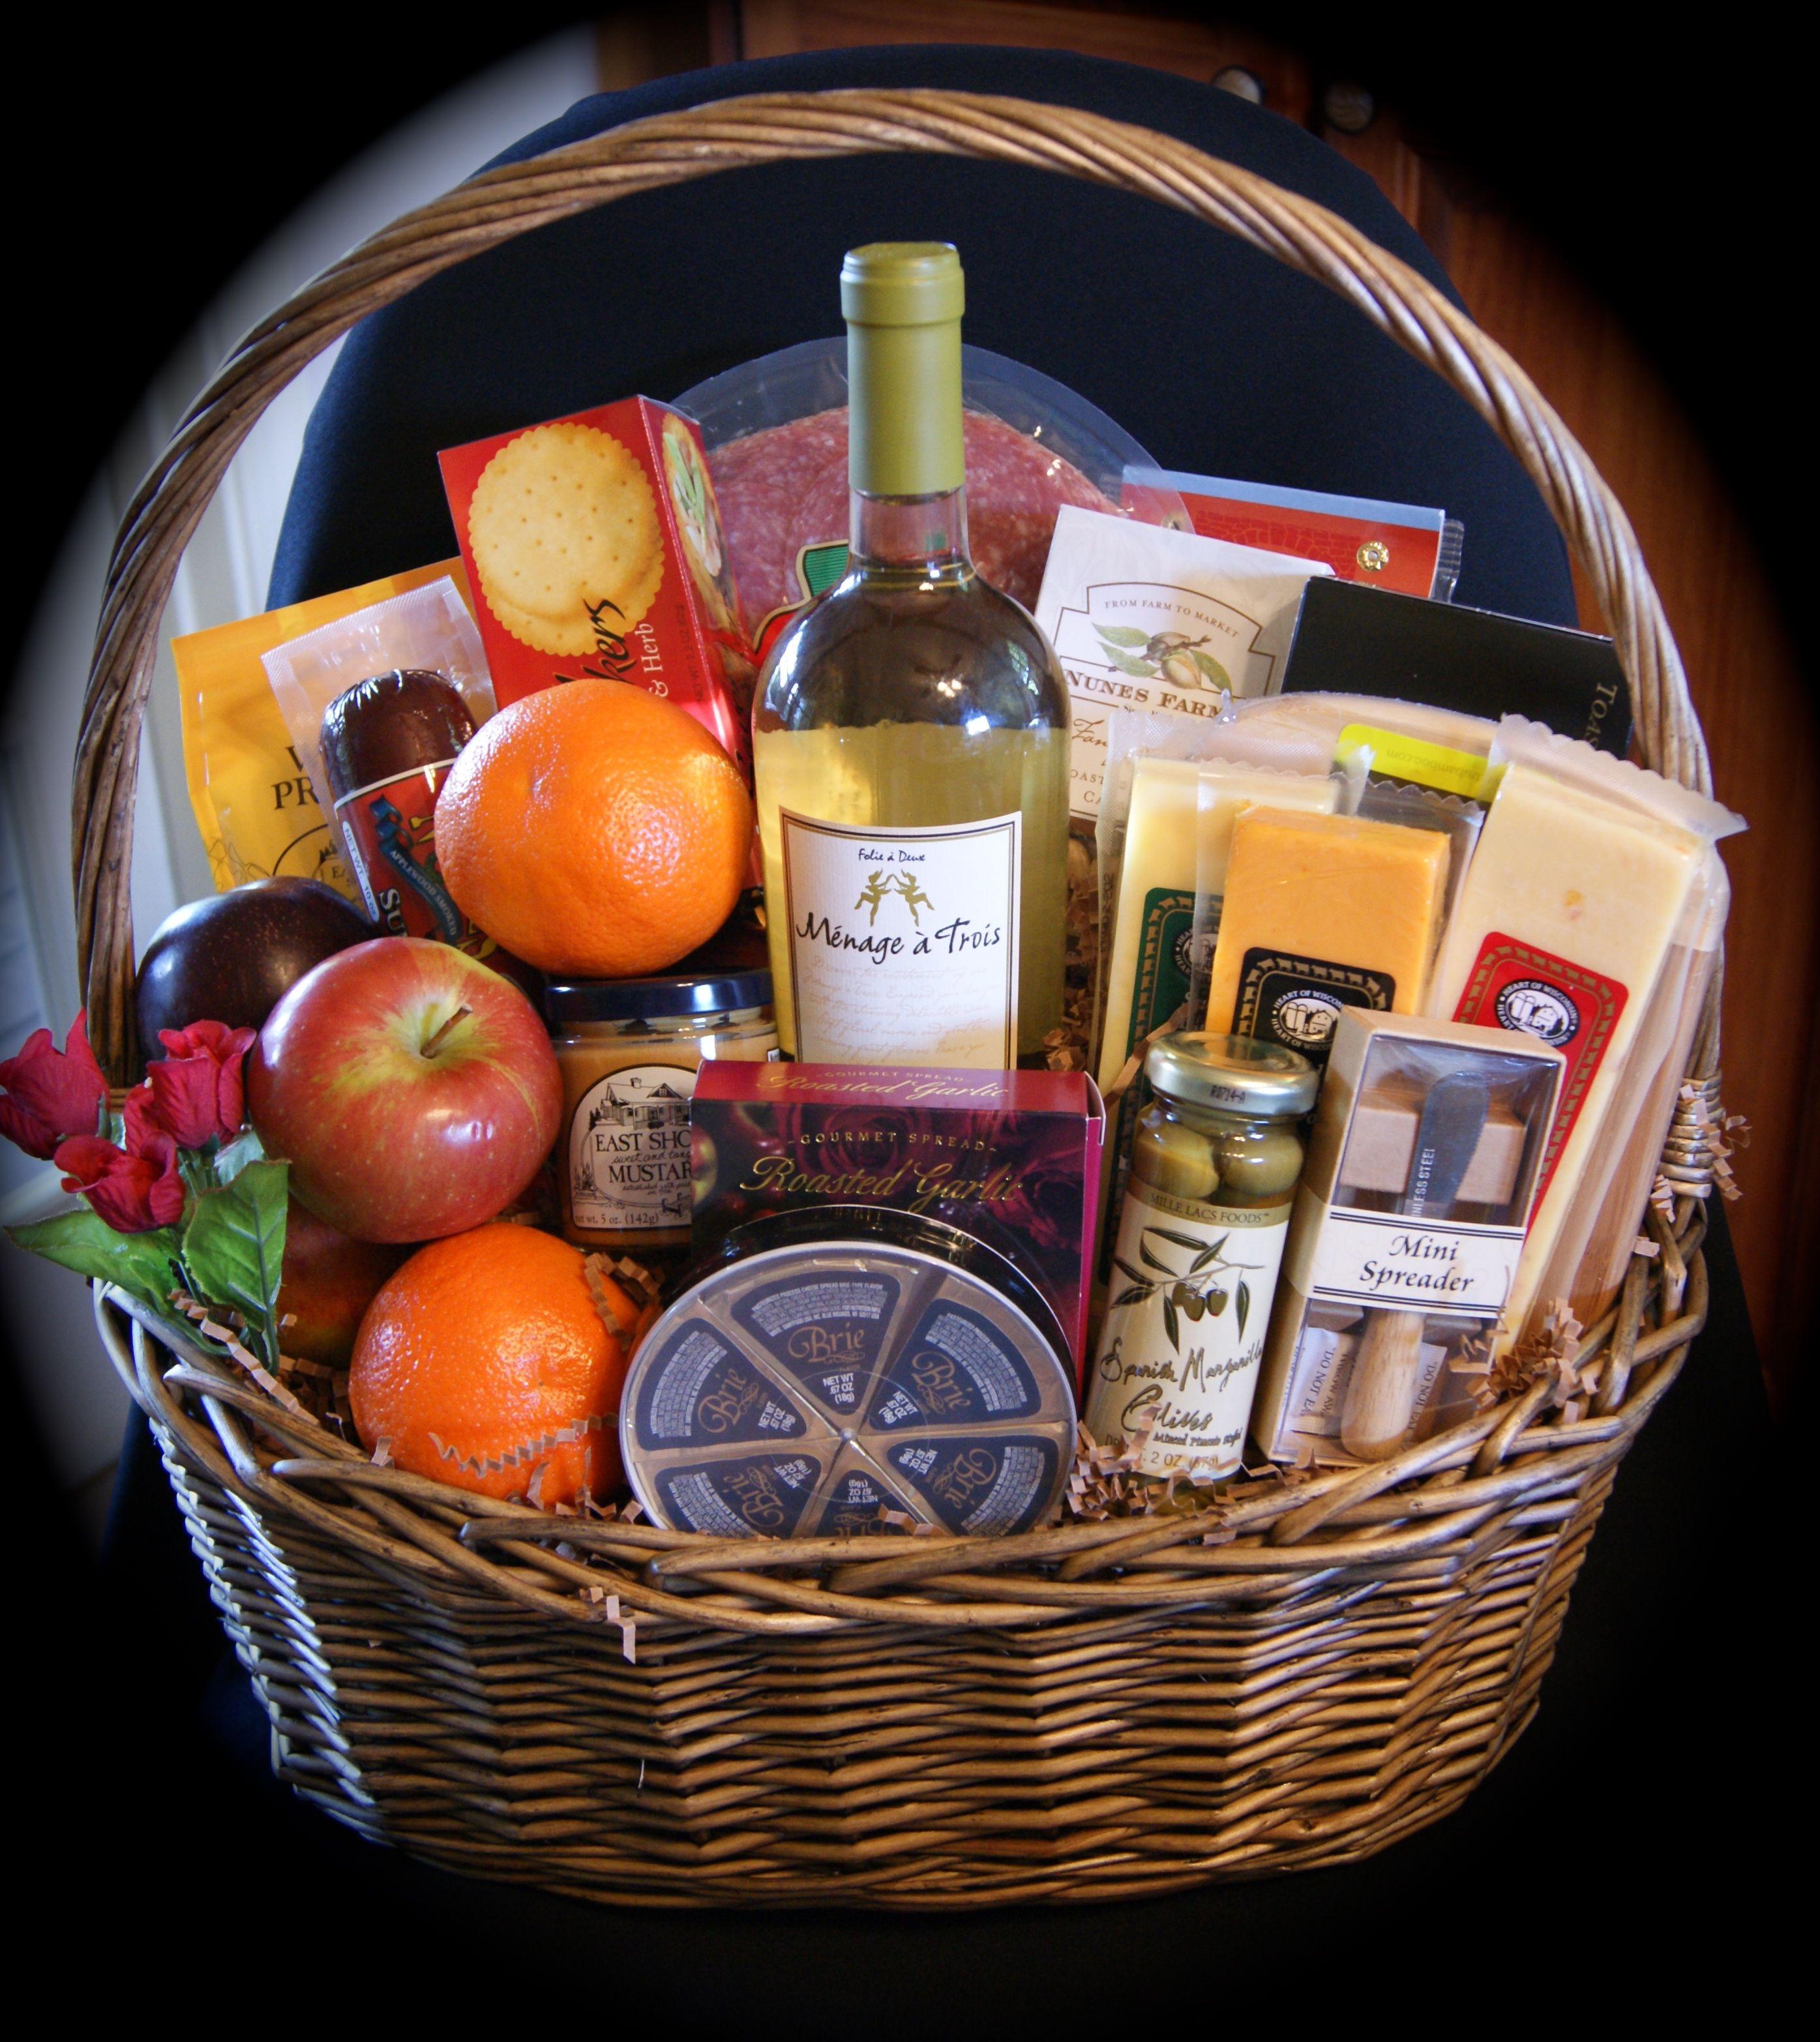 Extra large Gourmet Fruit and Wine Basket Price range $195 $245